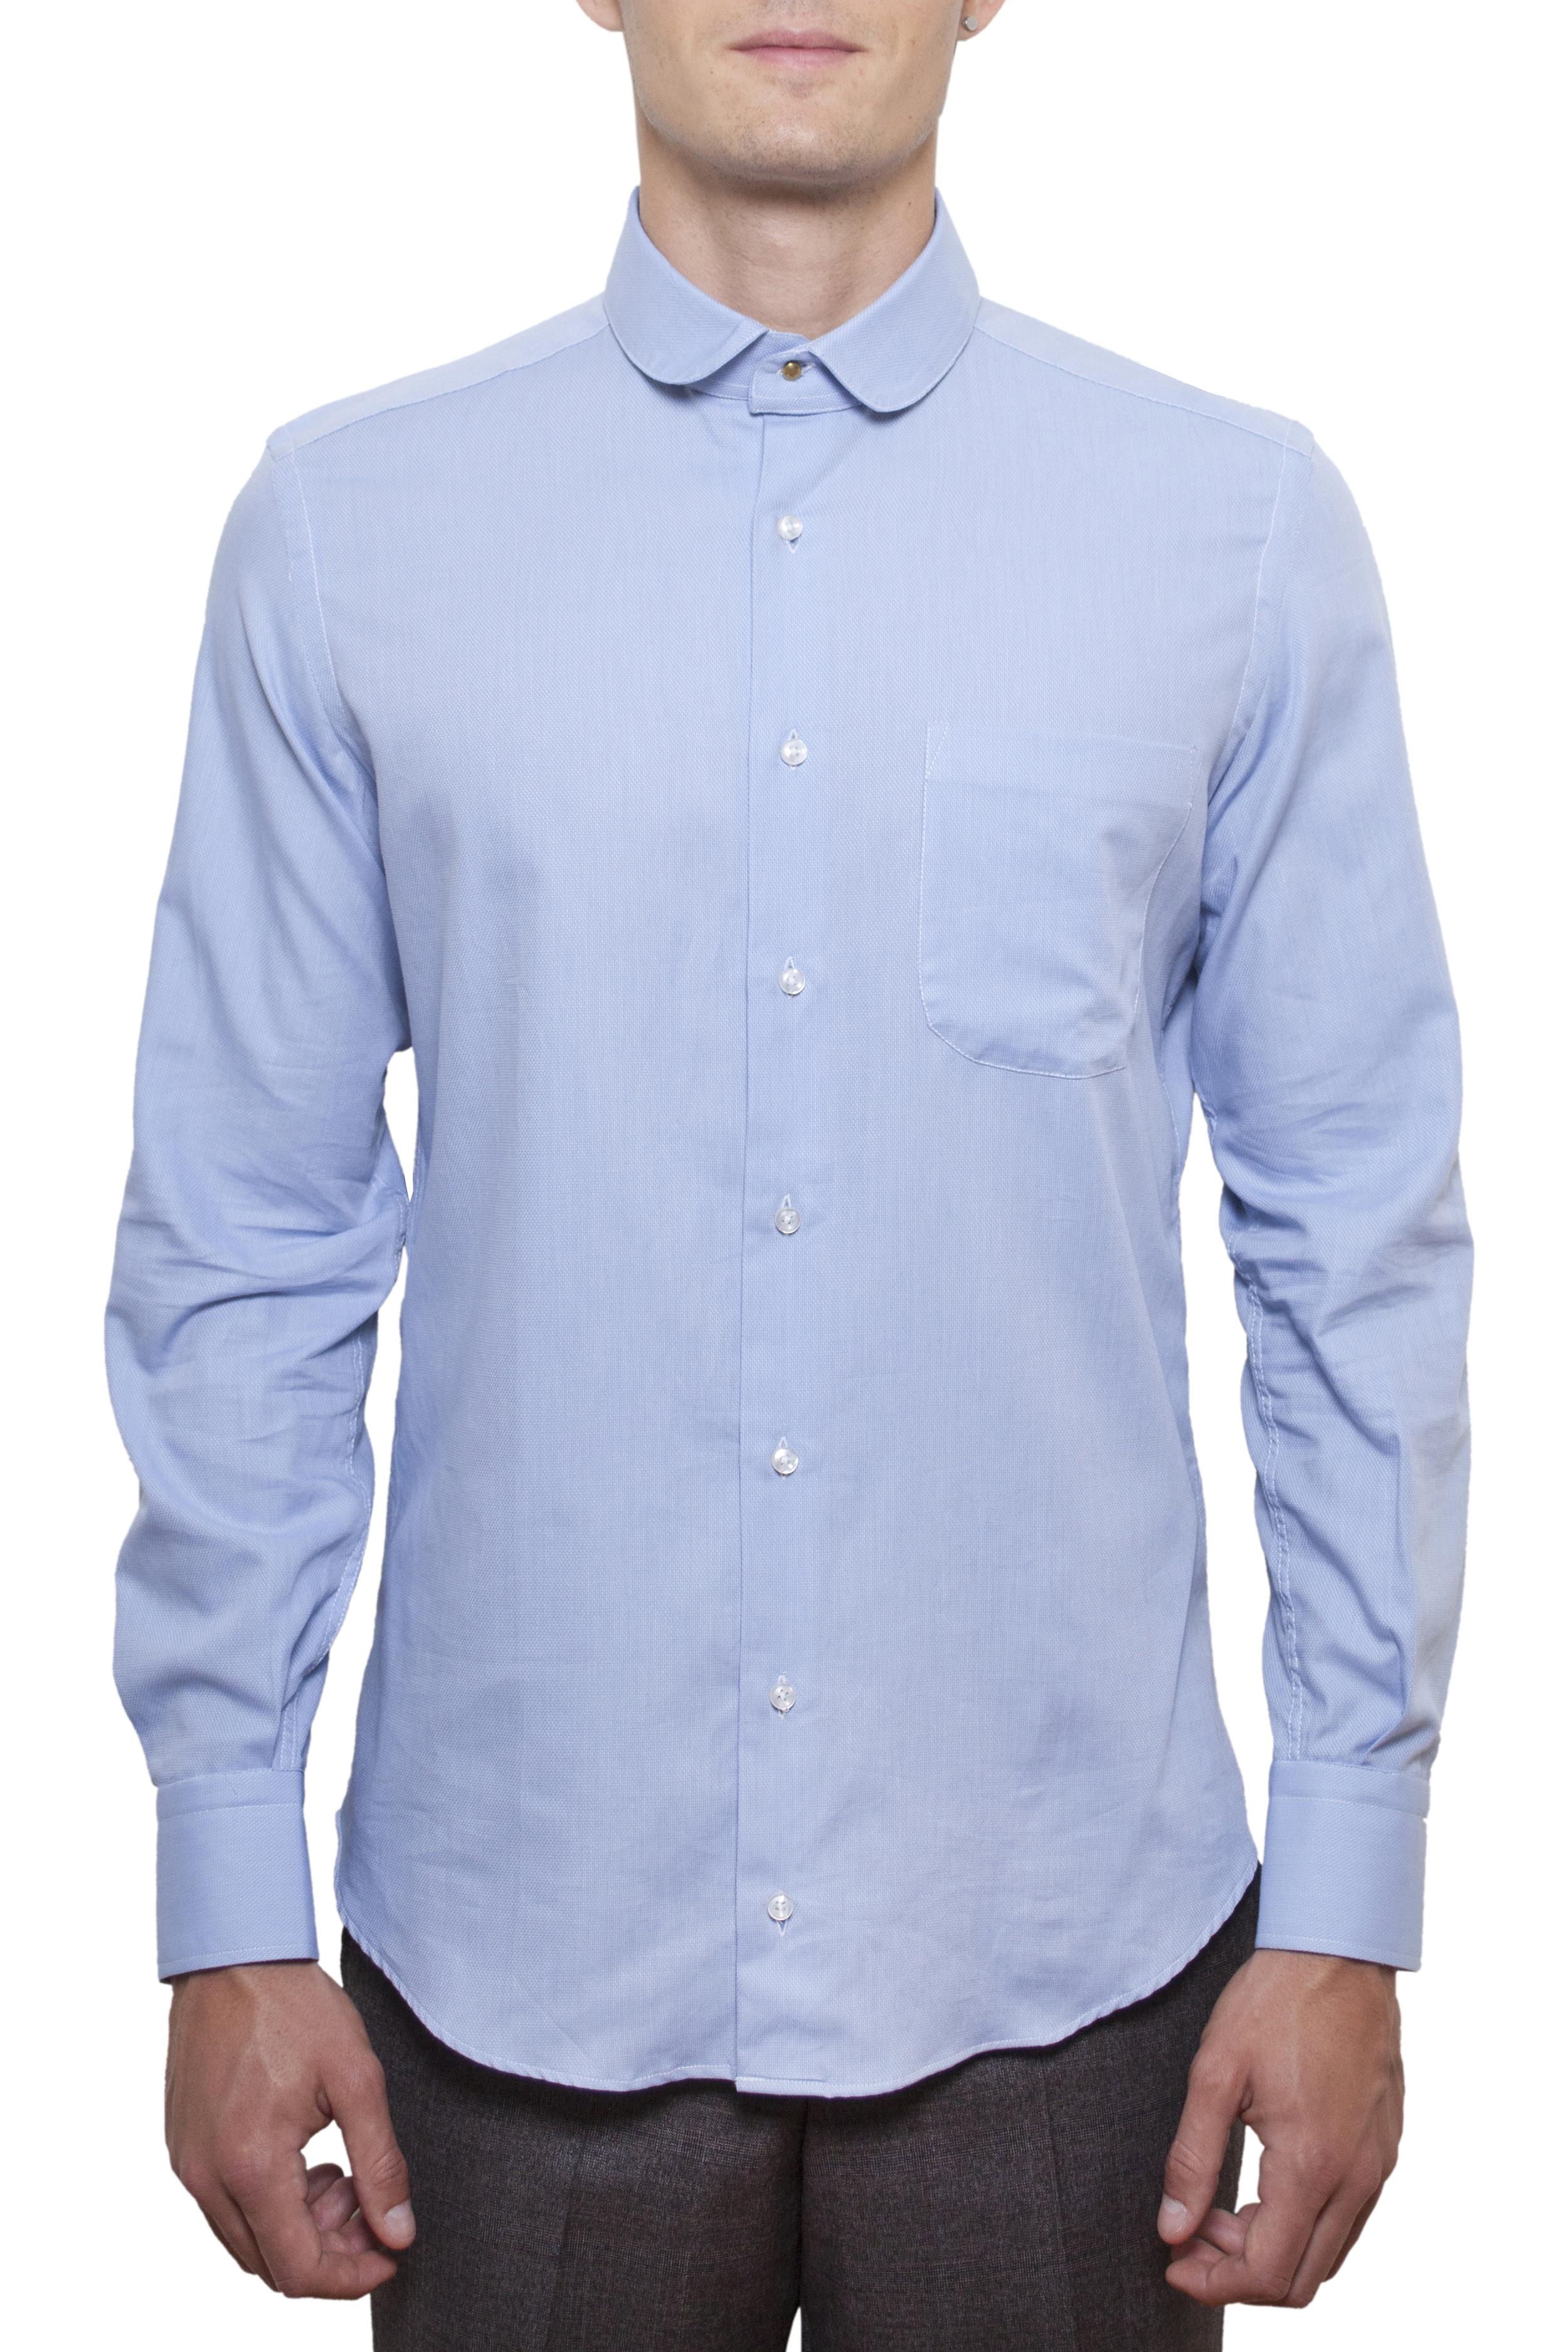 blue shirt1.jpg